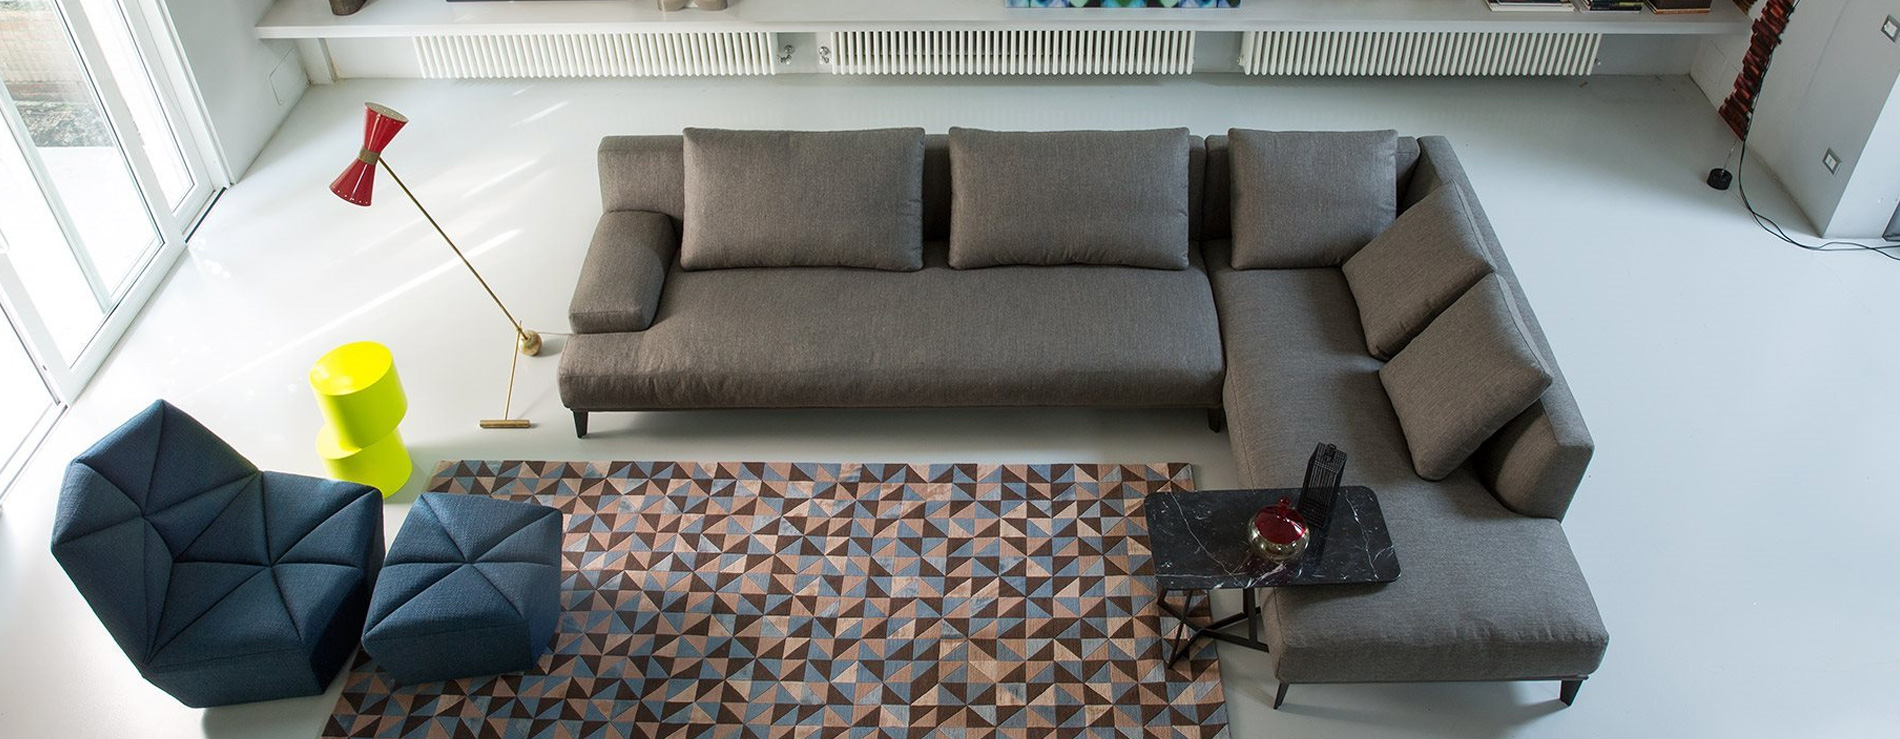 divano ronny alberta